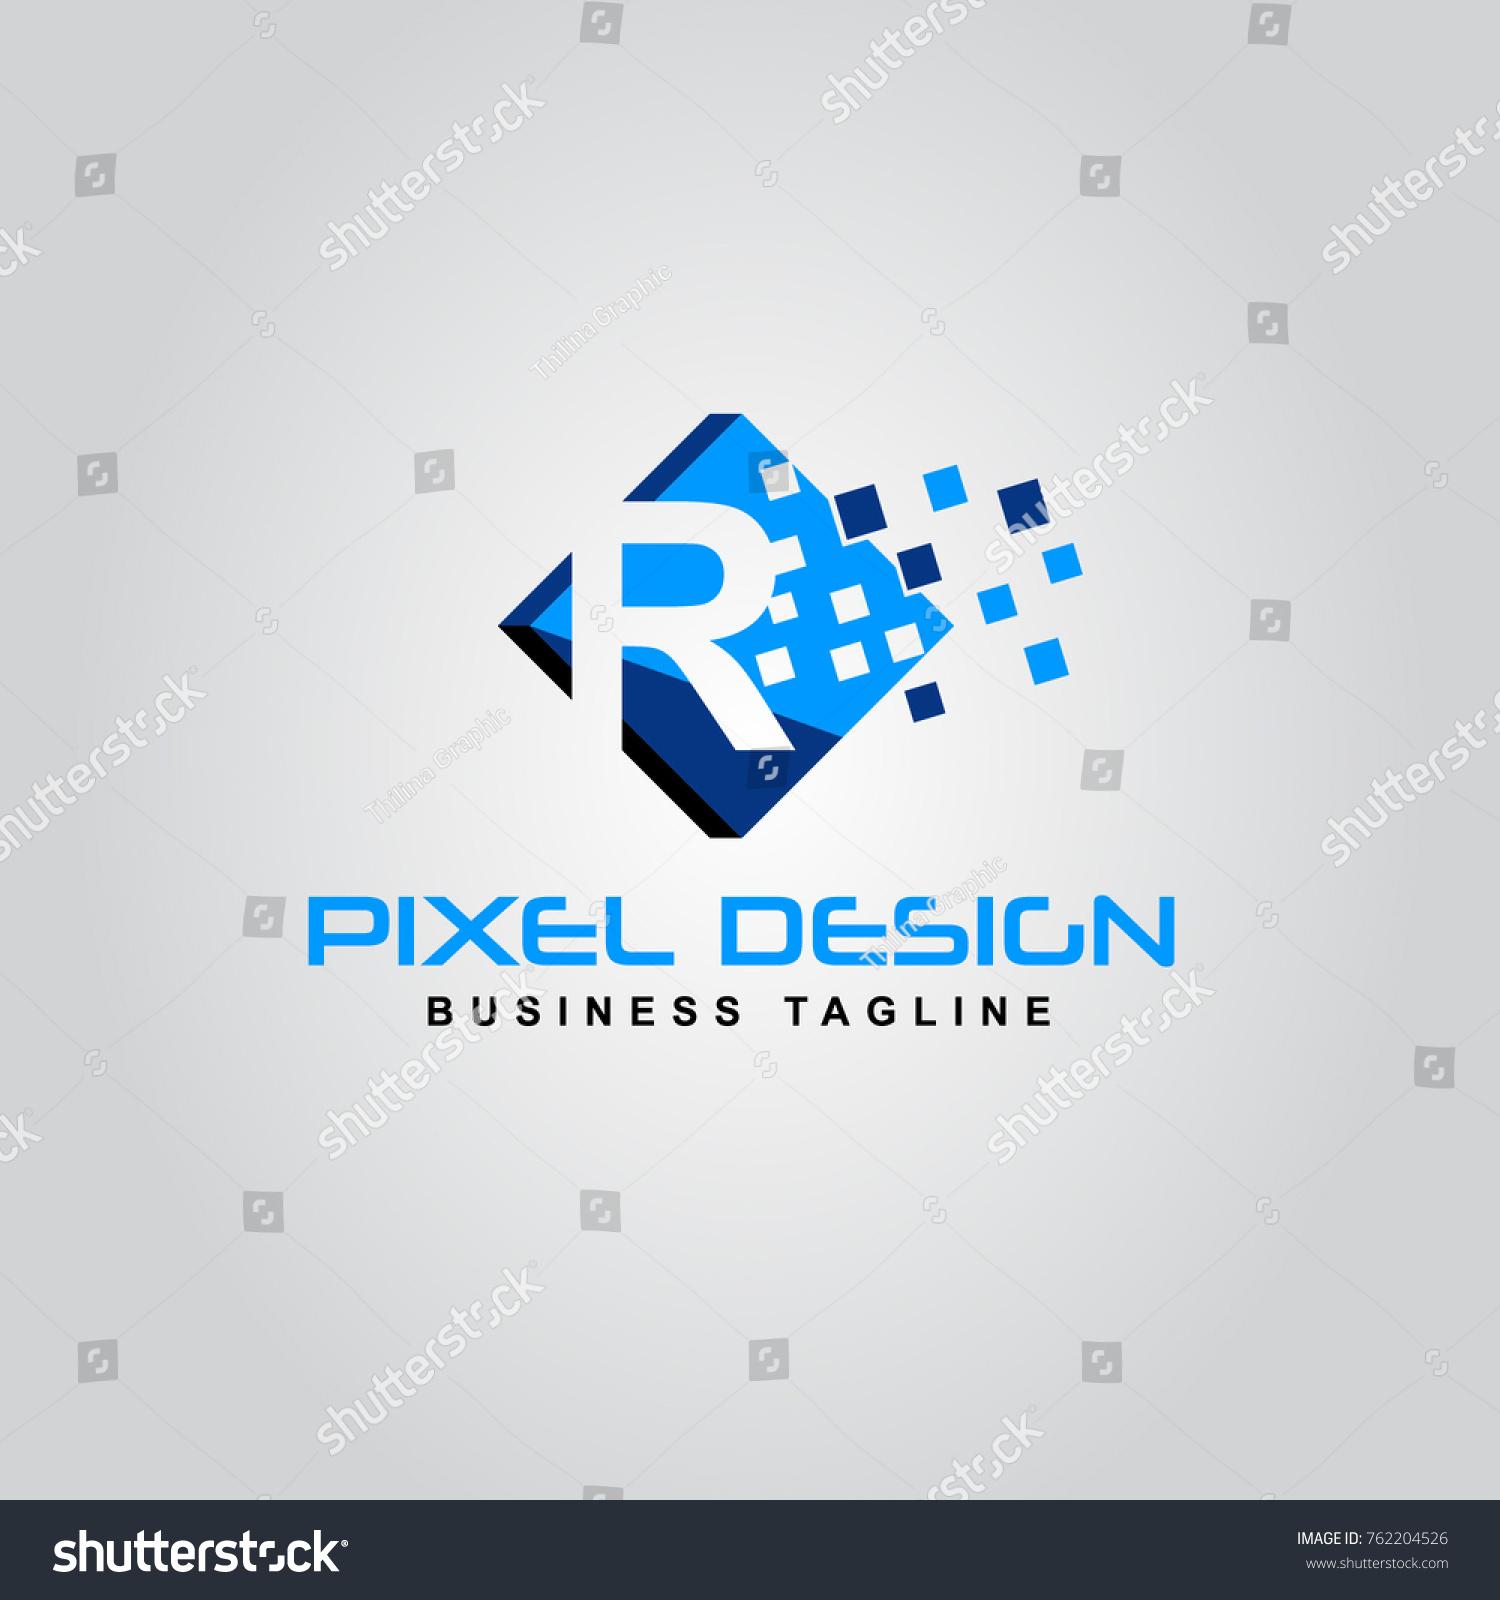 Pixel logo design r letter logo stock vector 762204526 shutterstock pixel logo design of the r letter logo r pixel logo modern creative alphabet letter buycottarizona